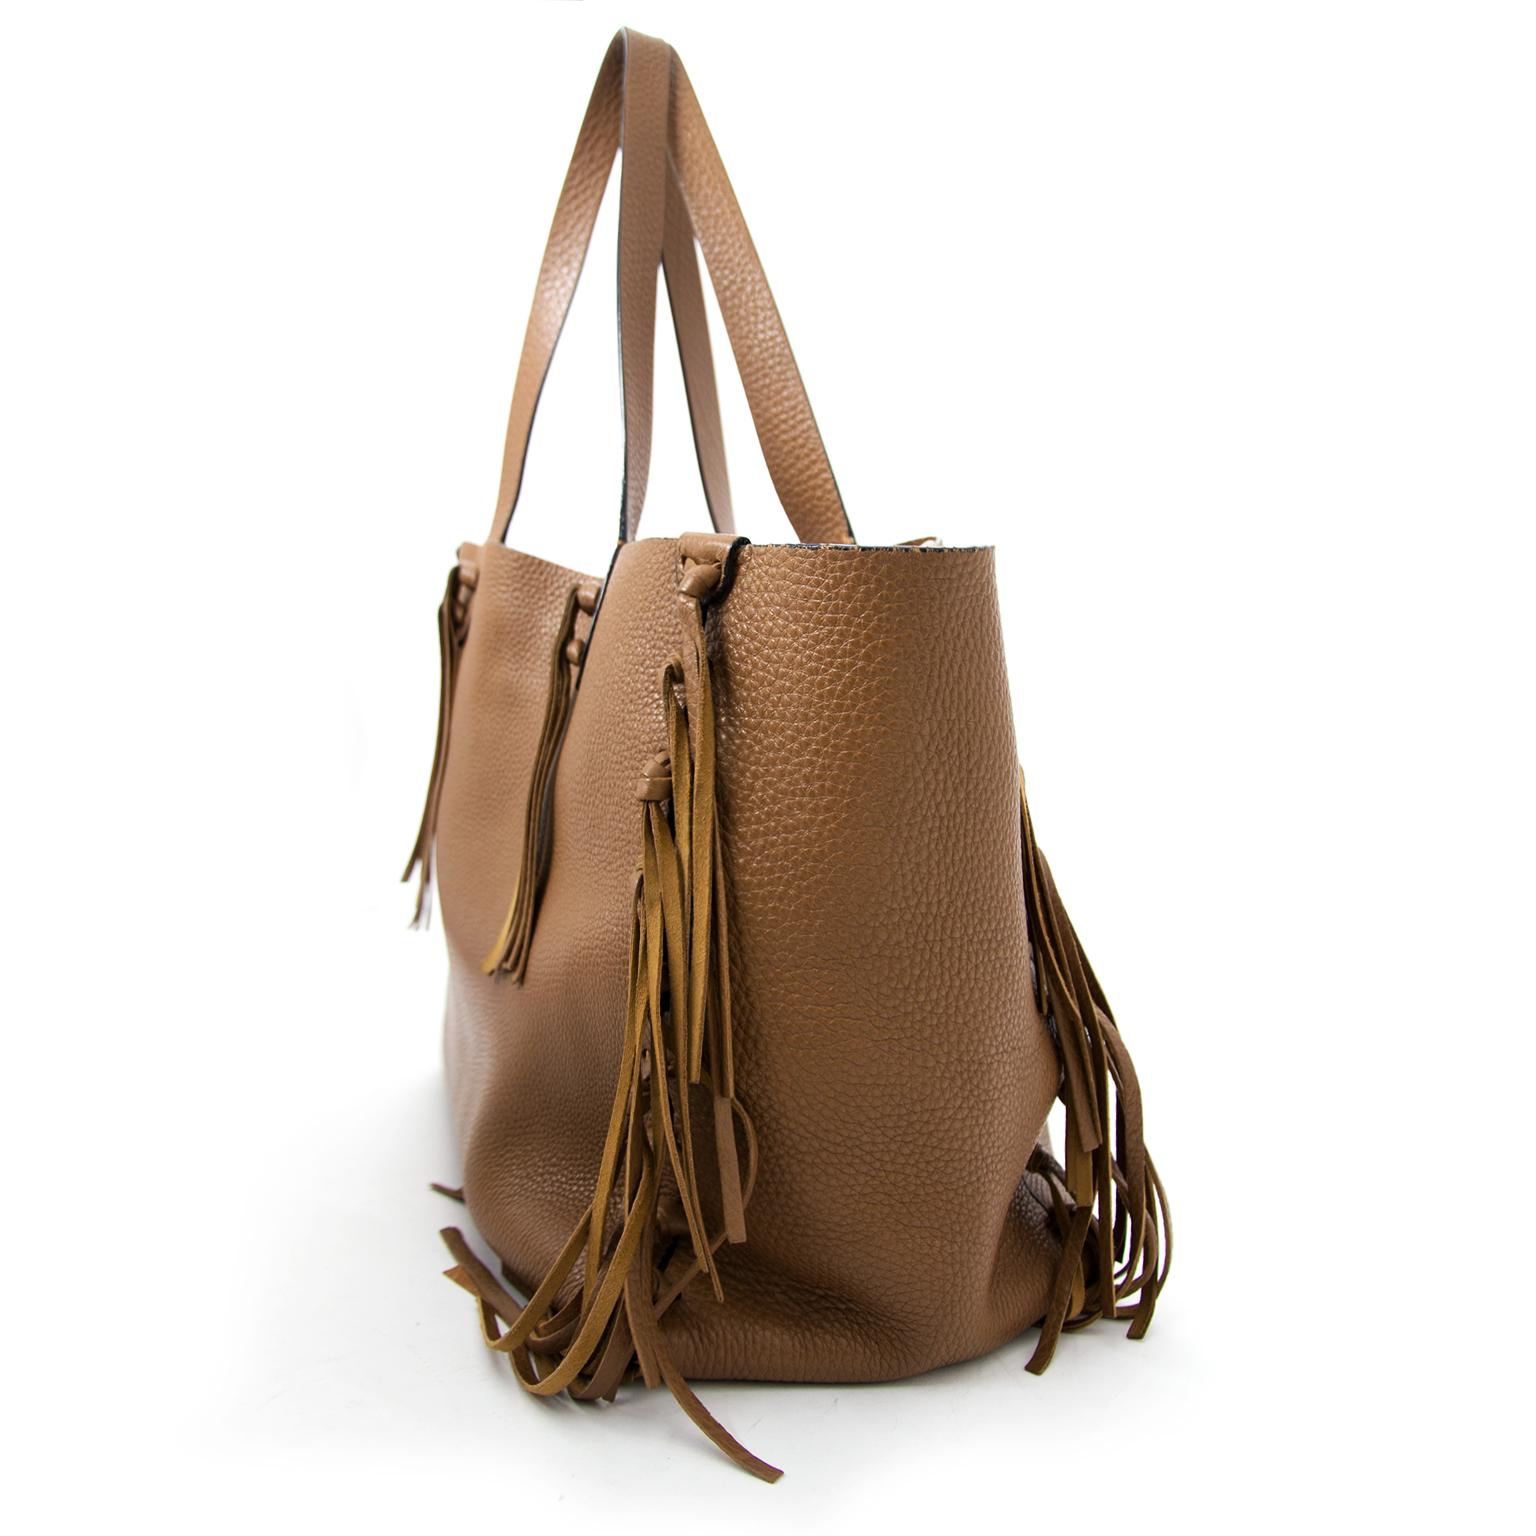 Buy authentic Valentino bags at Labellov.com